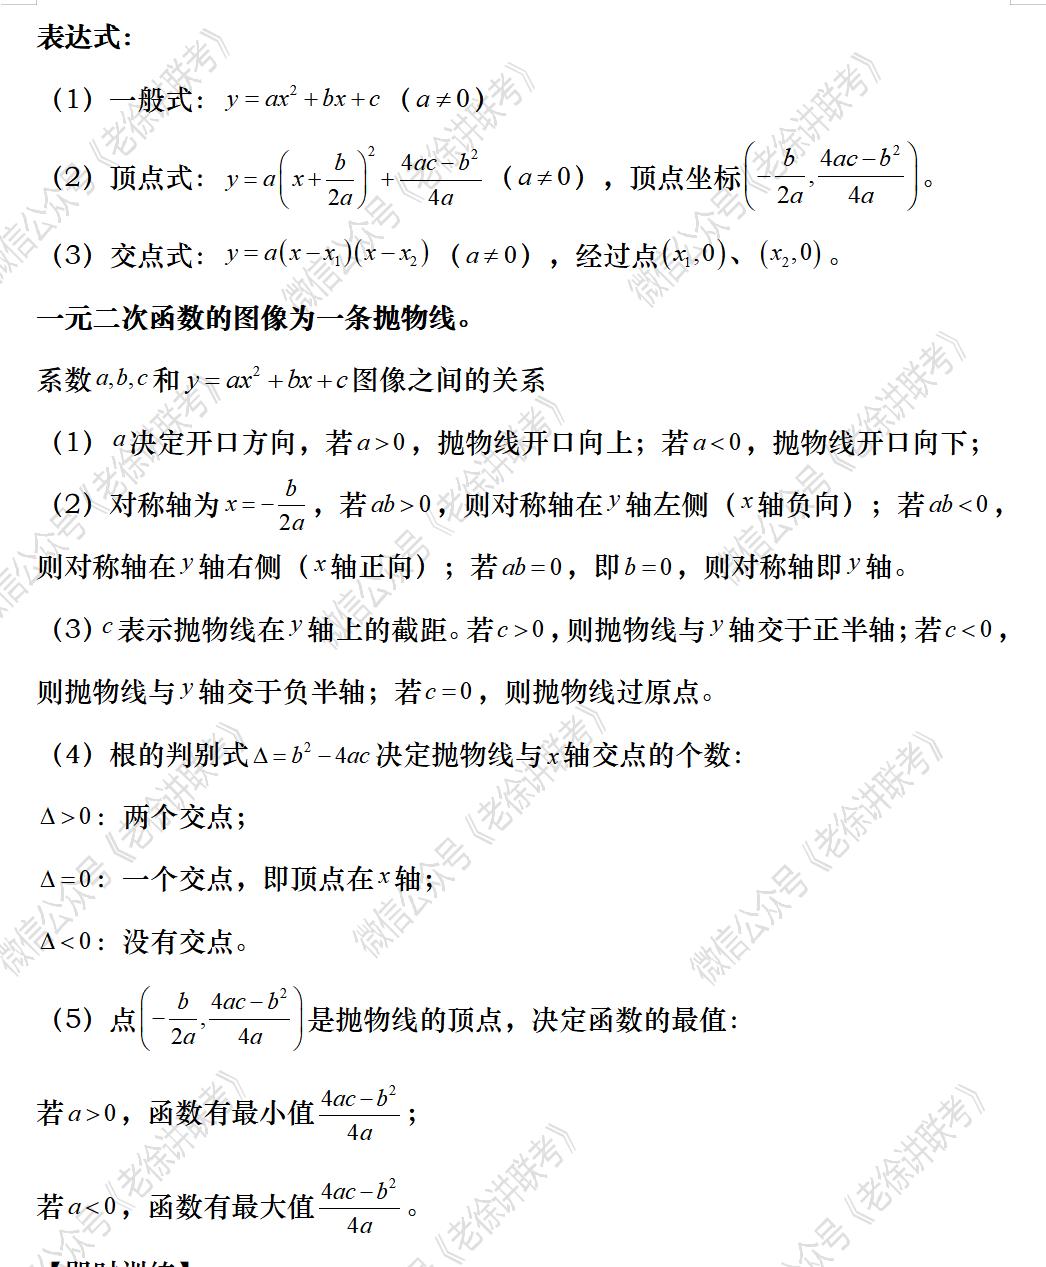 2022MBA考研|管理类联考:数学专题训练-一元二次函数图像(第一期)